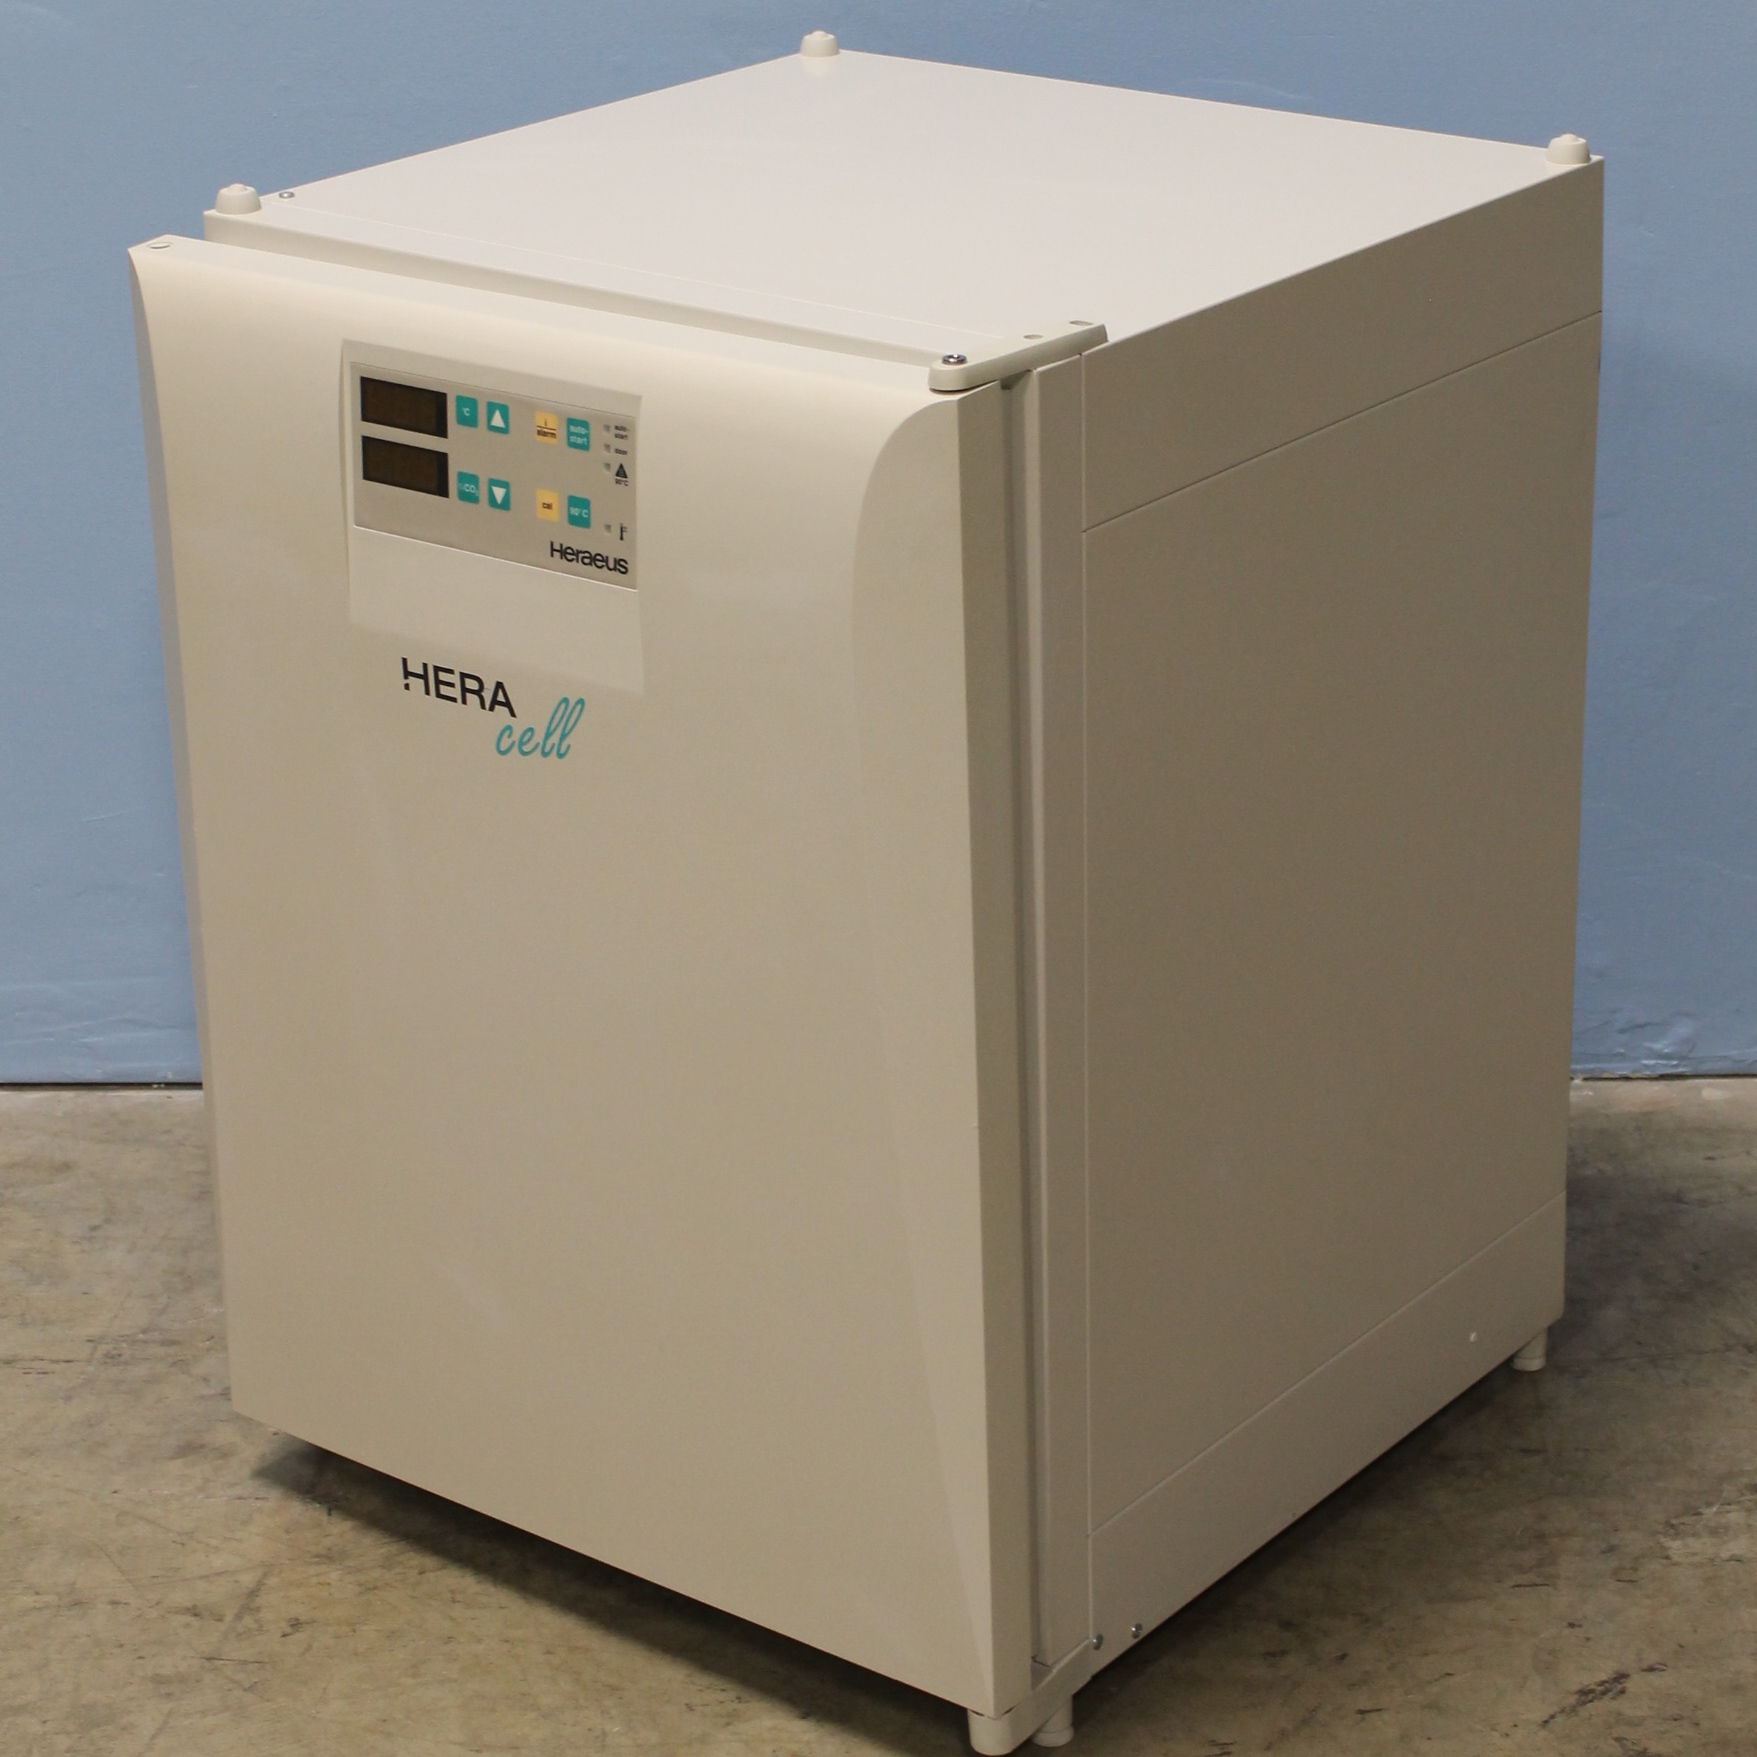 Heraeus/Kendro Lab HERAcell Incubator Image